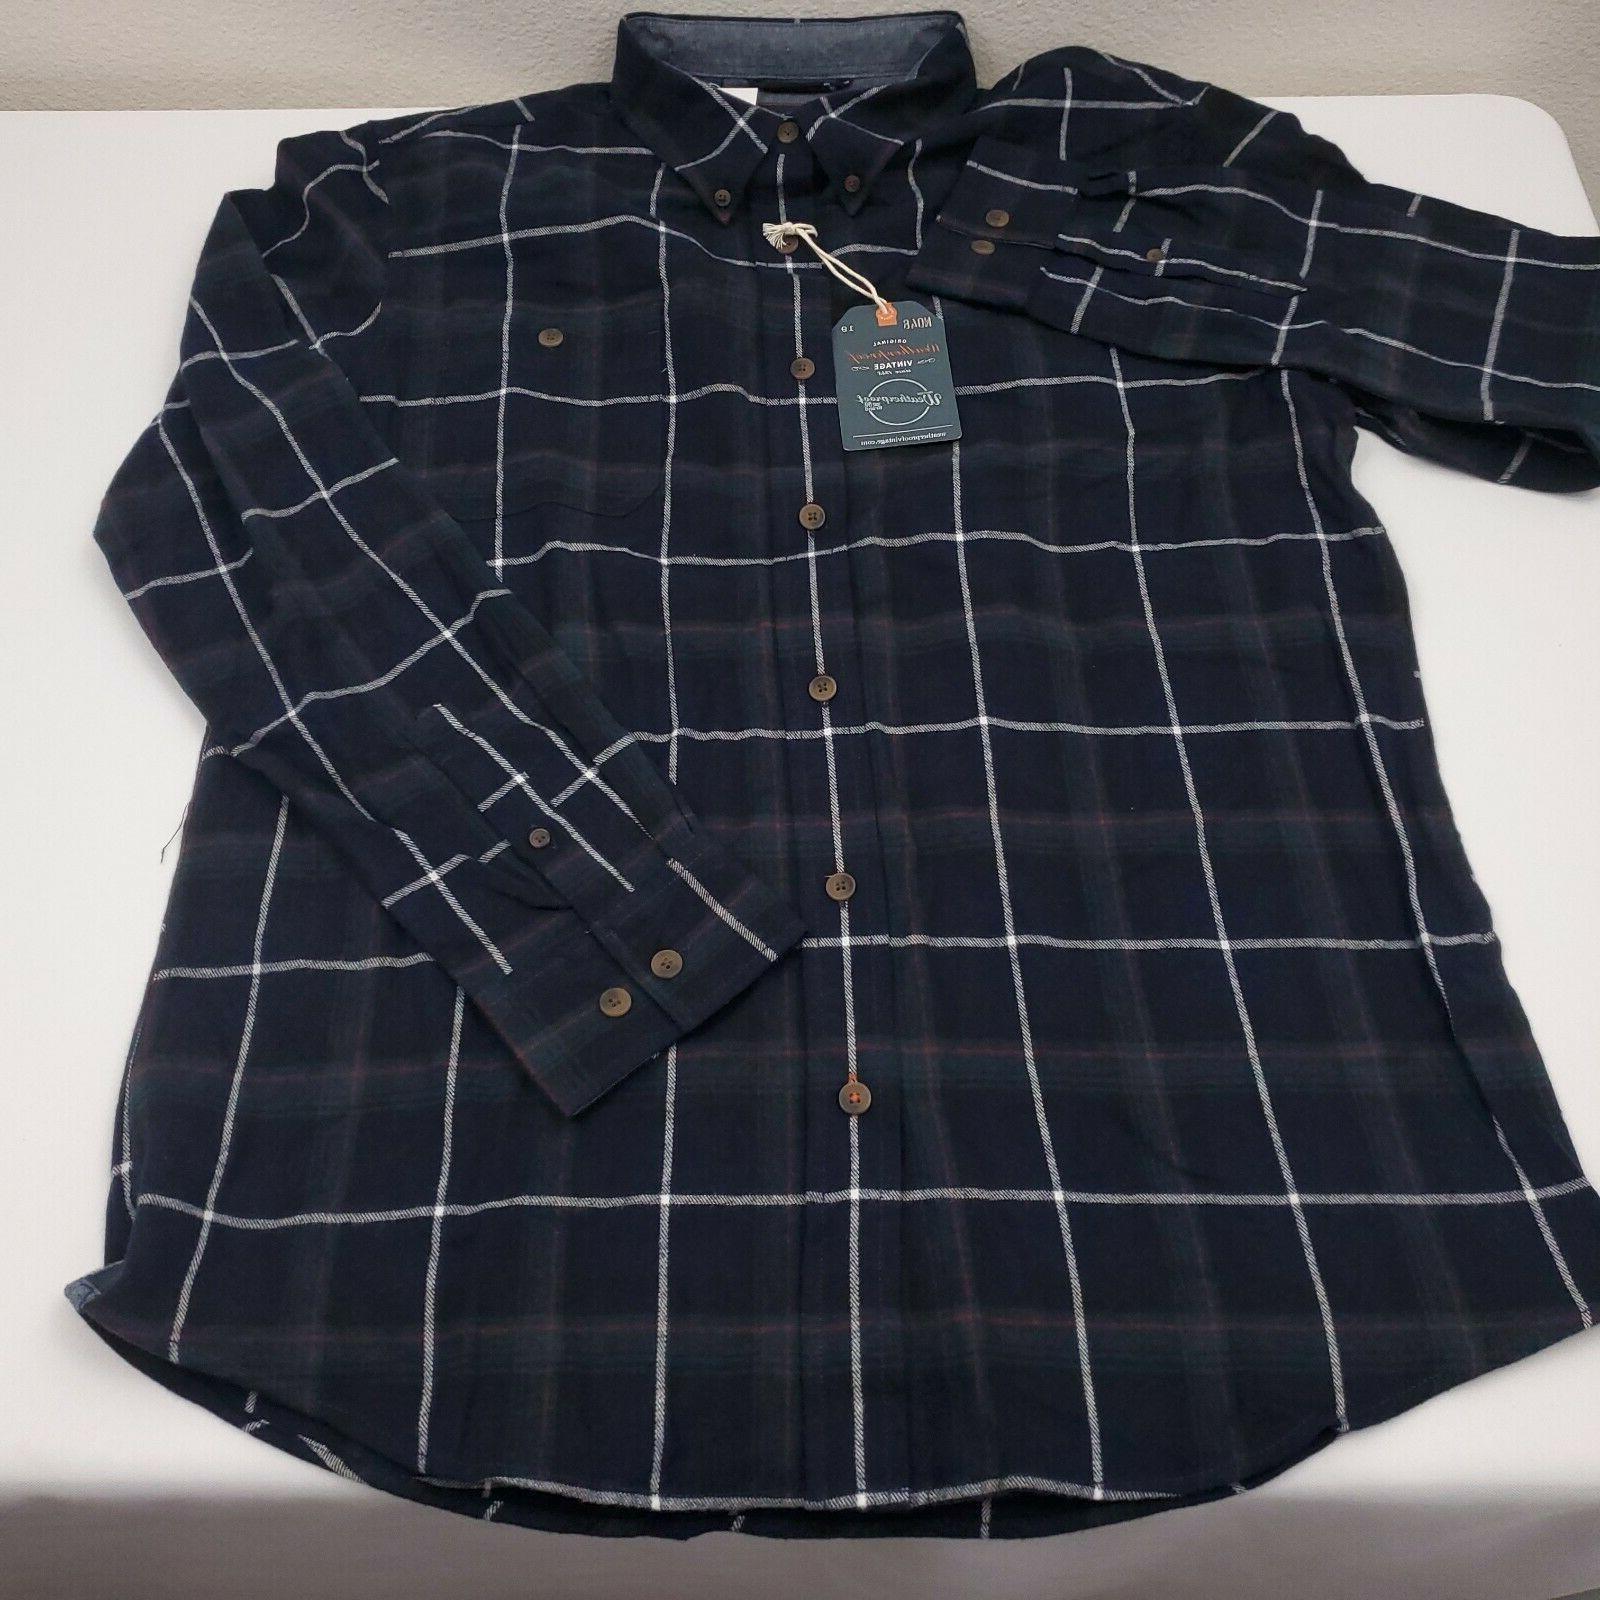 Weatherproof Vintage Men's Shirt Sleeve Cotton Plaid Blue NEW